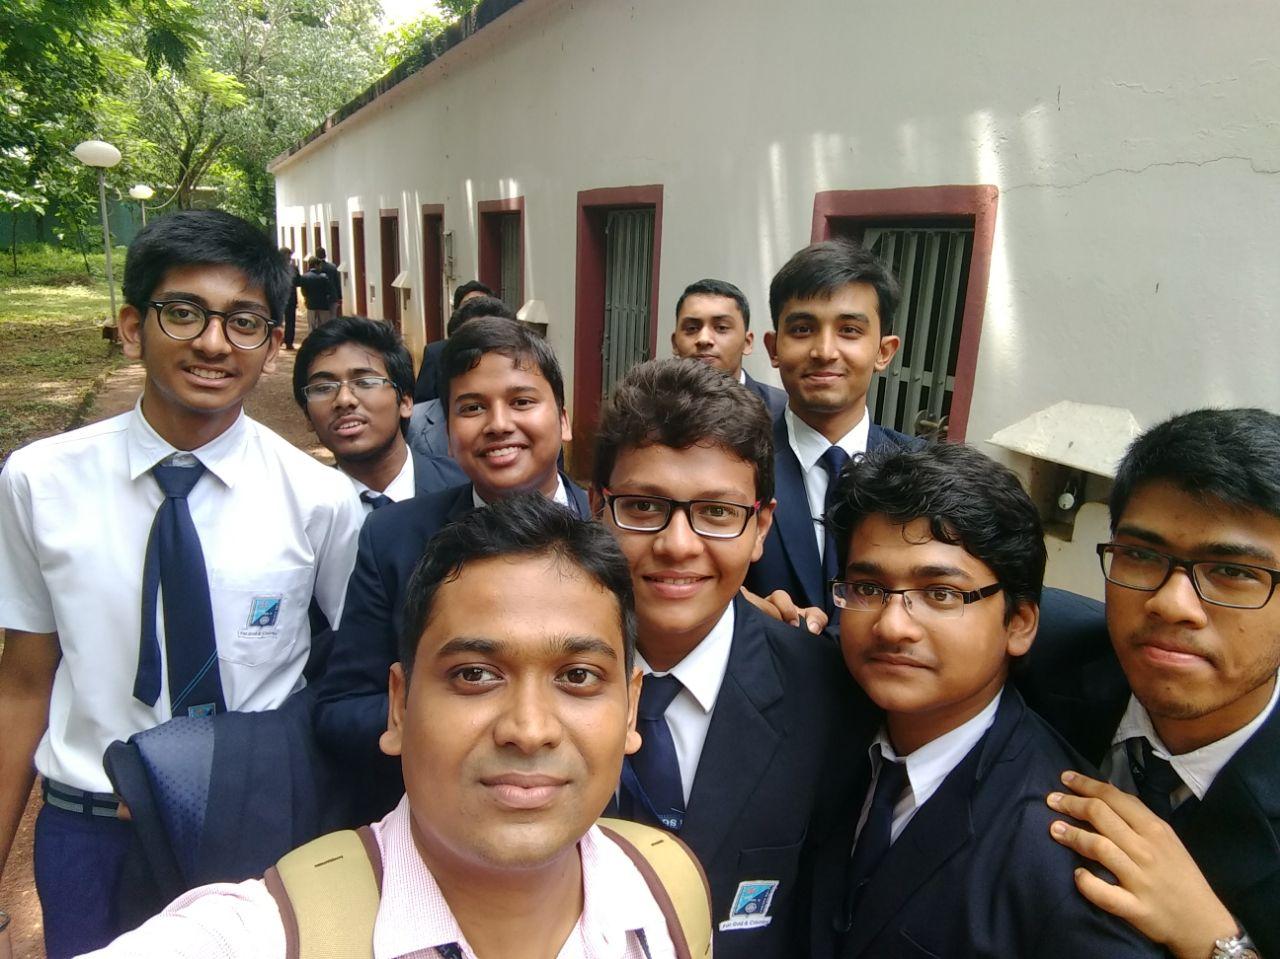 IIT Kharagpur Tour and Robotics Seminar